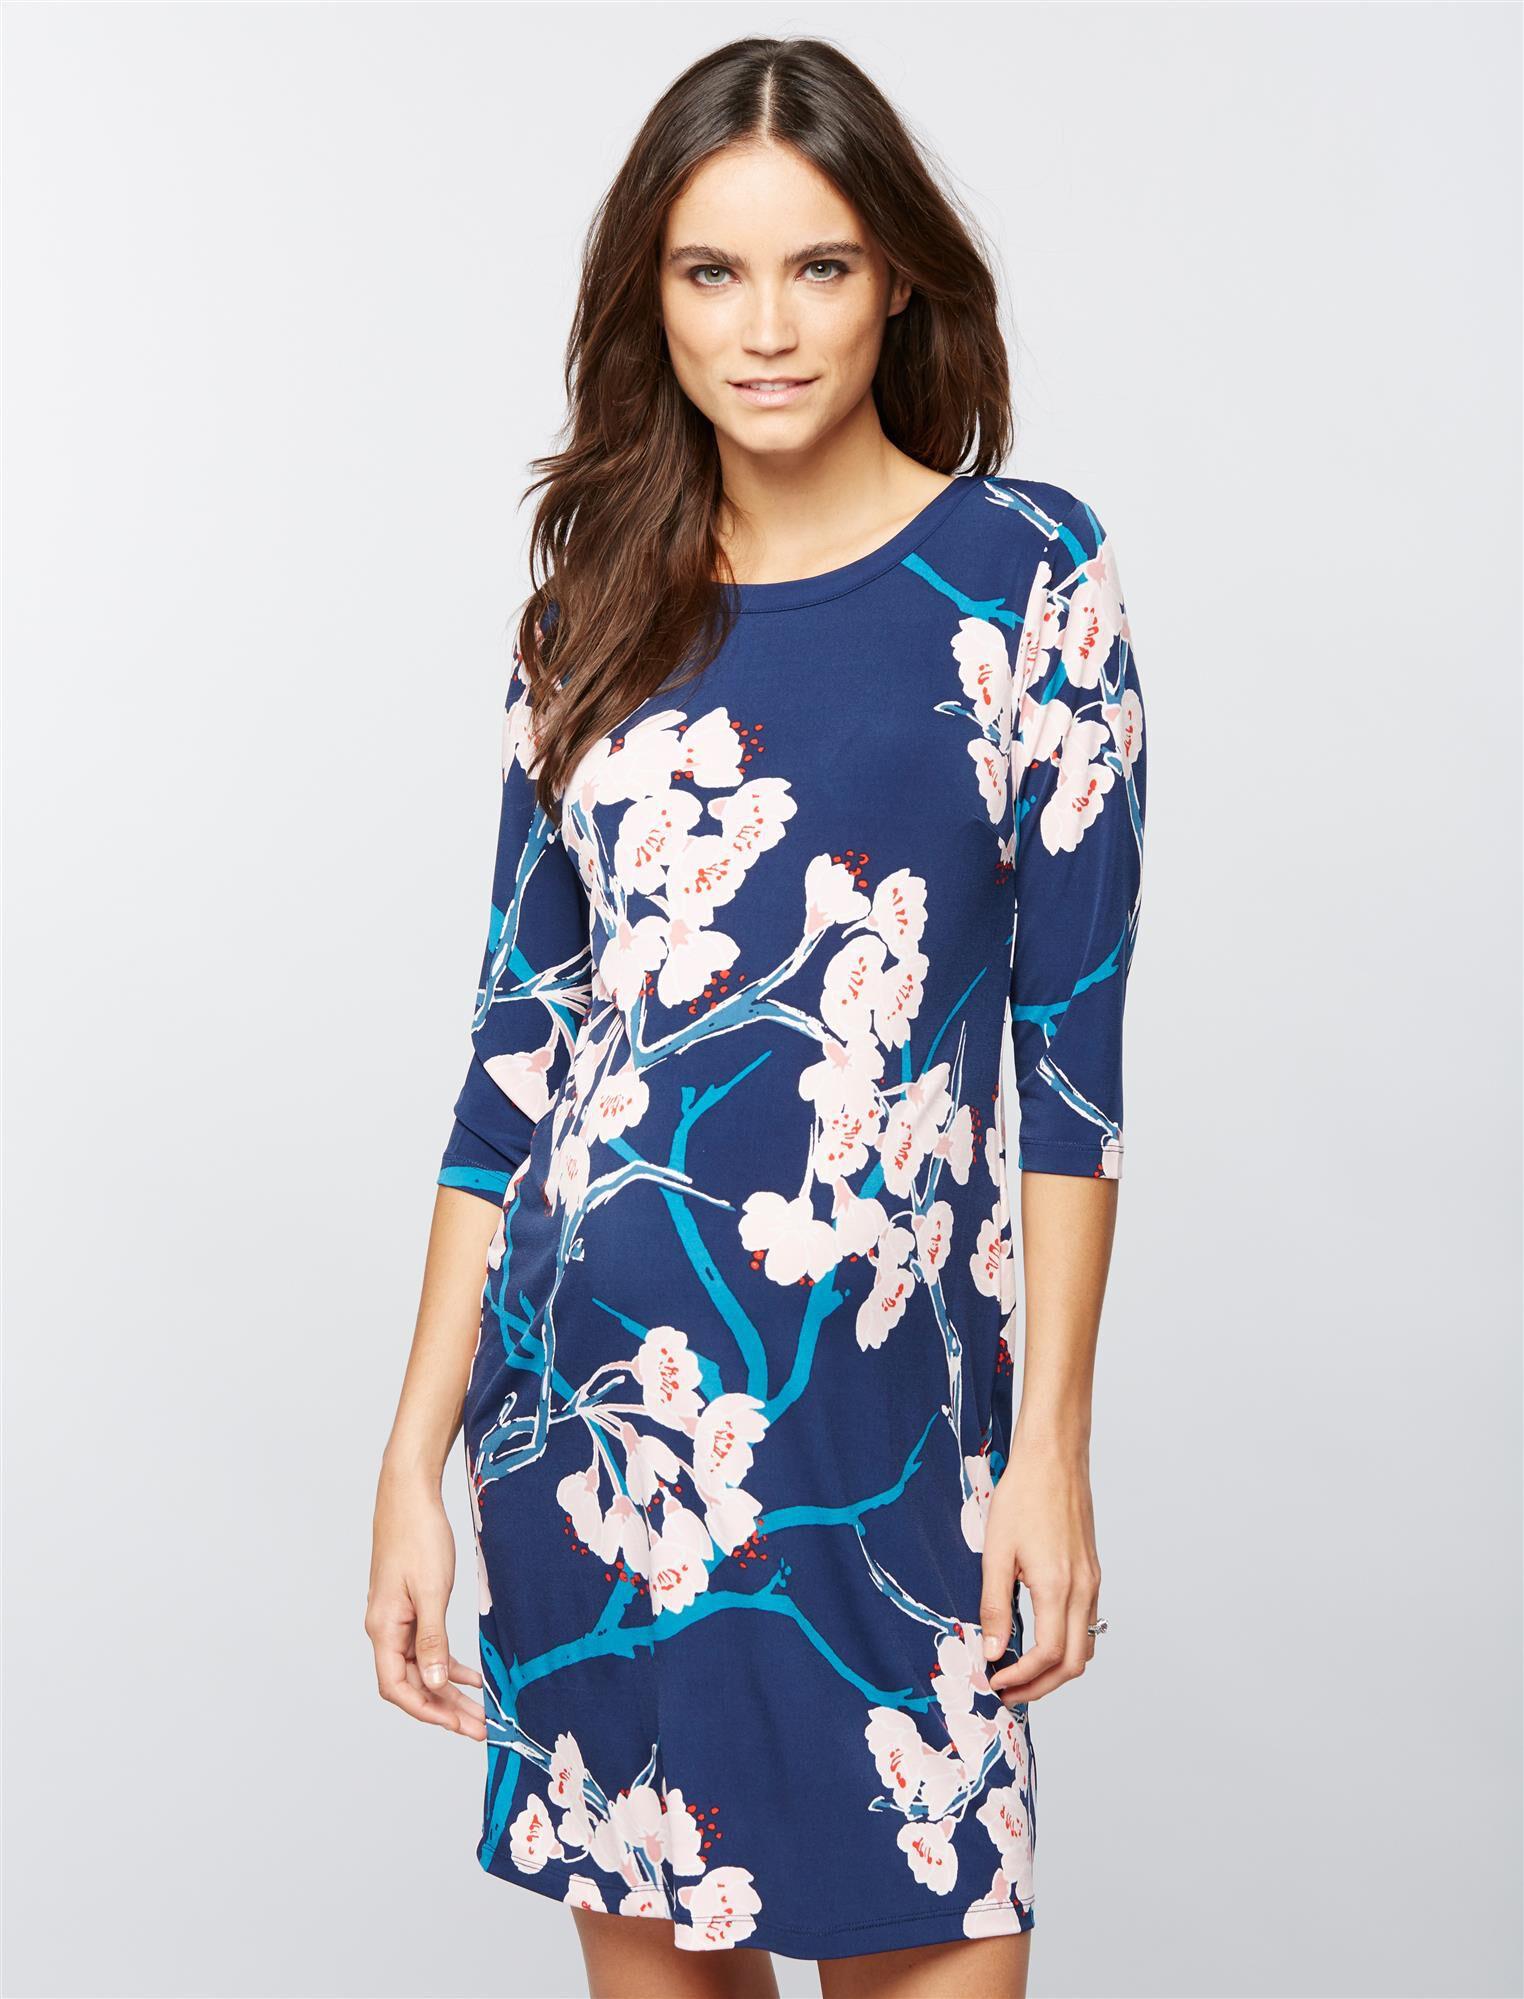 Floral Maternity Sheath Dress